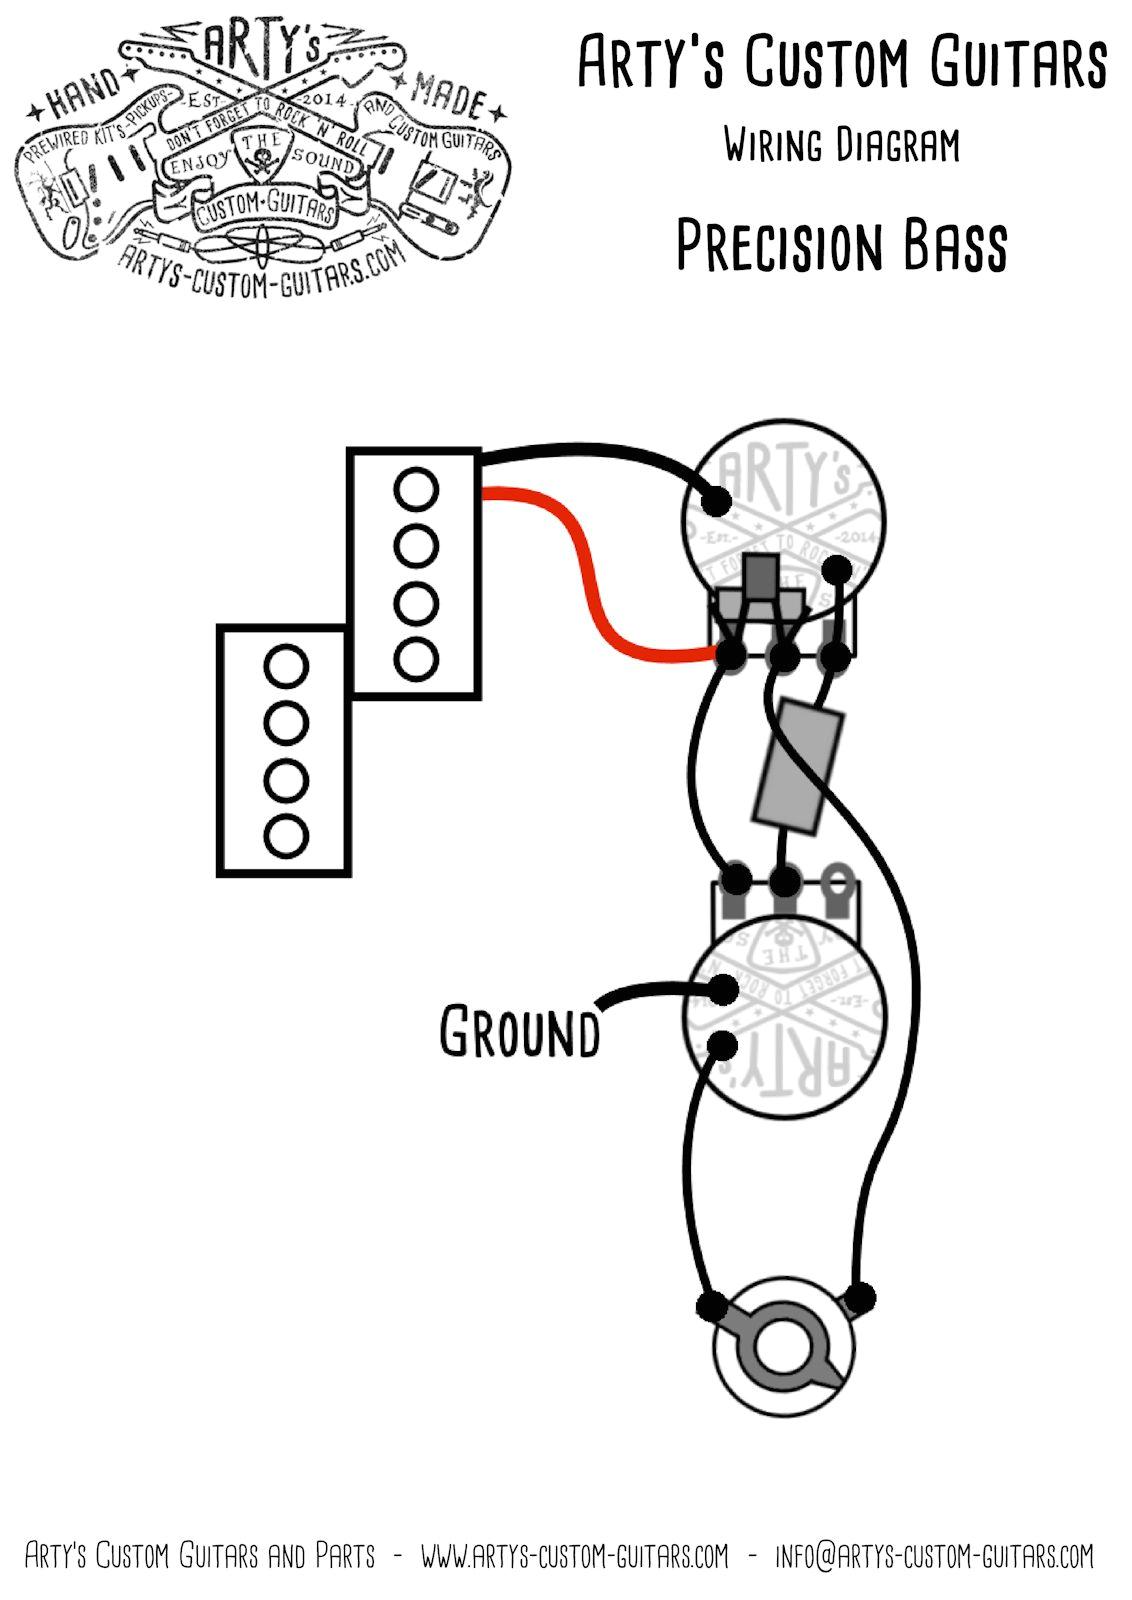 Fender Precision Bass Wiring Diagram 1959 Fender Precision Bass Wiring Diagram Wiring Diagram